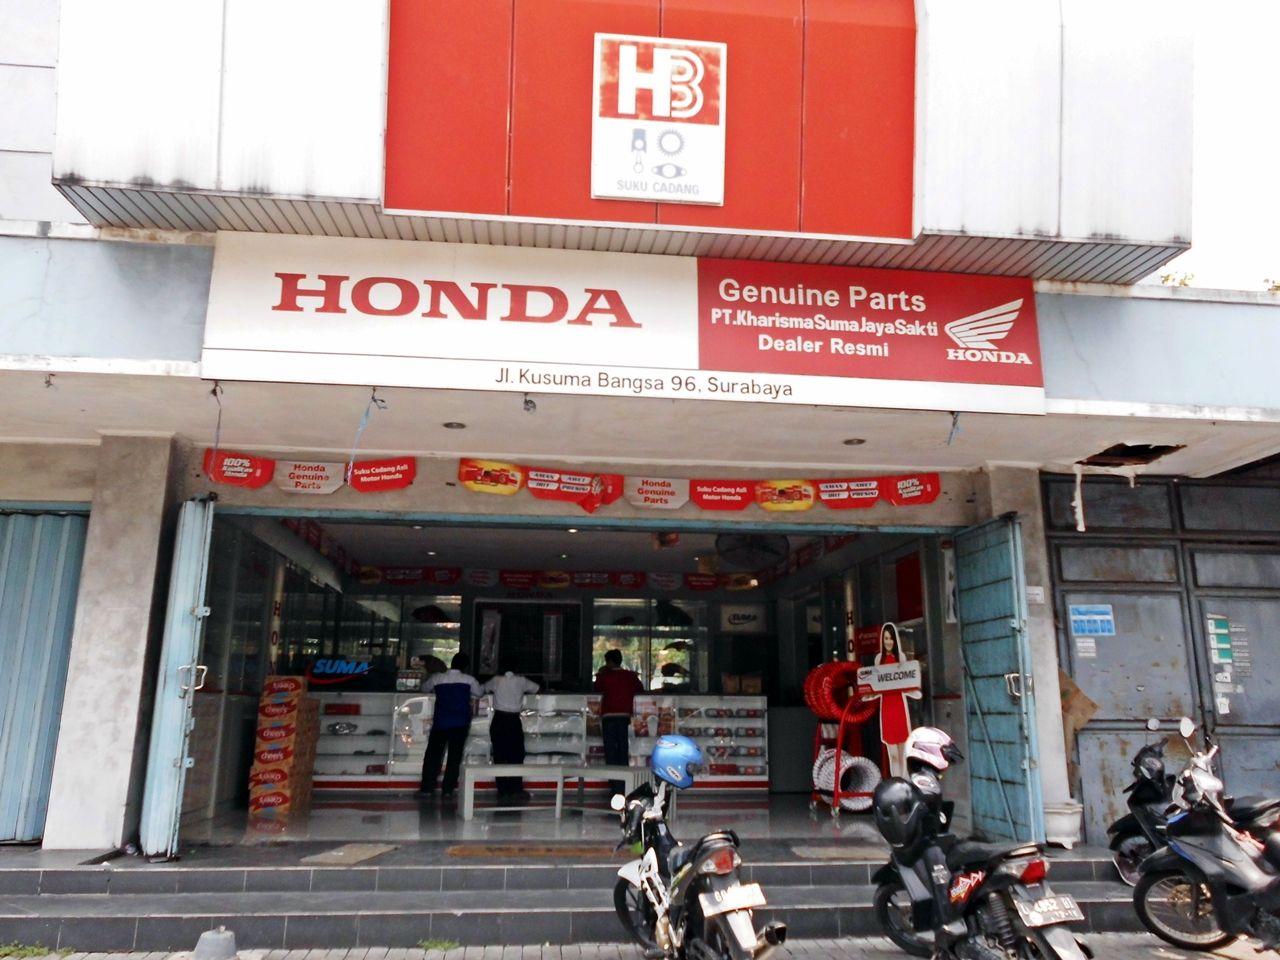 Tampak Depan Jaringan Suma Parts Shop Kusuma Bangsa Surabaya Honda Spareparts Sumapartsshop Surabaya Honda Surabaya Motor Honda